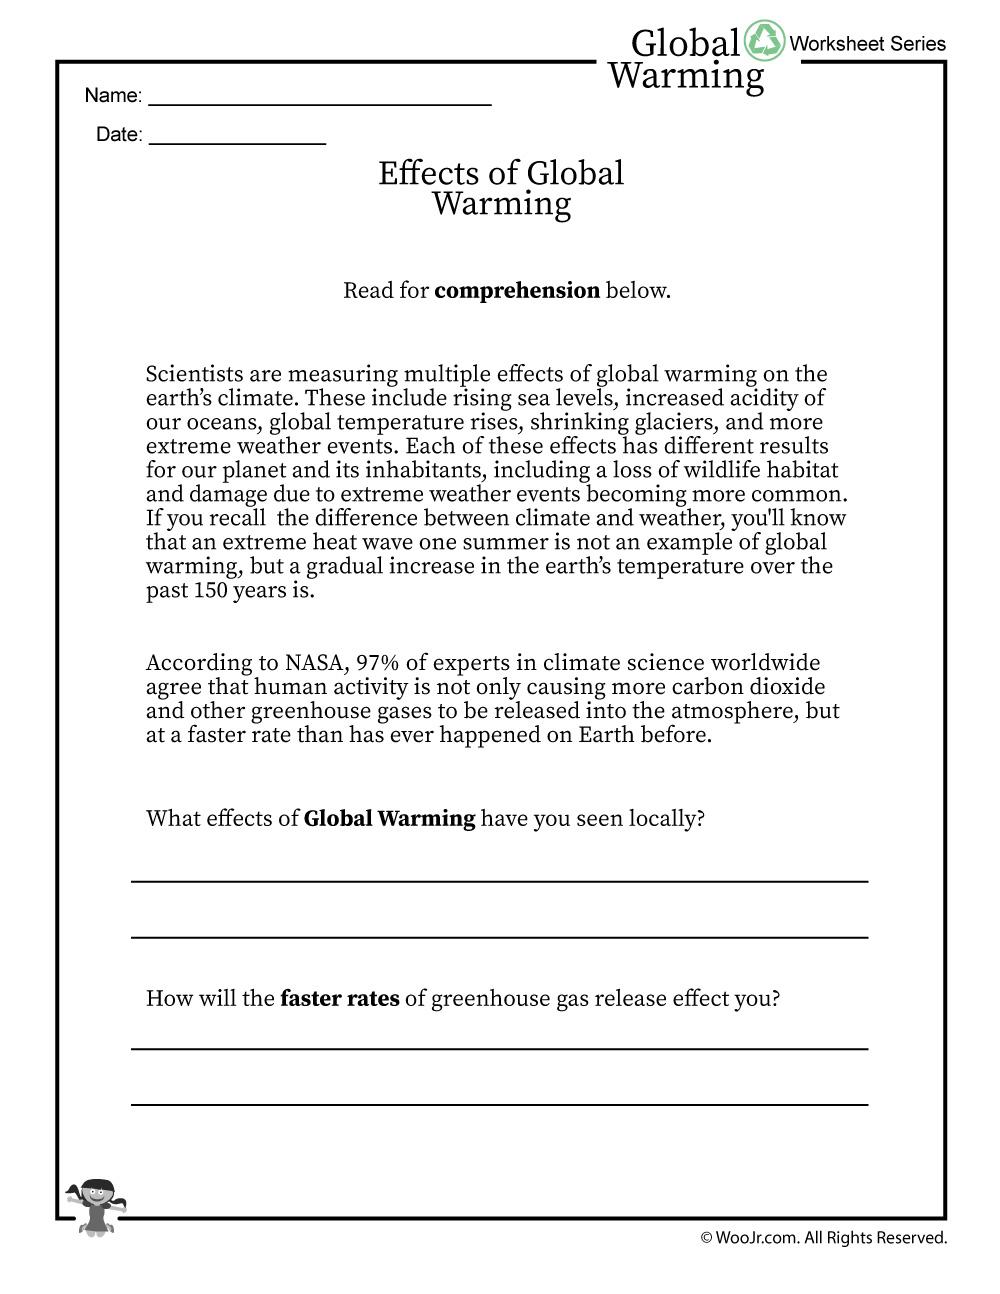 global warming effects printable reading worksheet woo jr kids activities. Black Bedroom Furniture Sets. Home Design Ideas